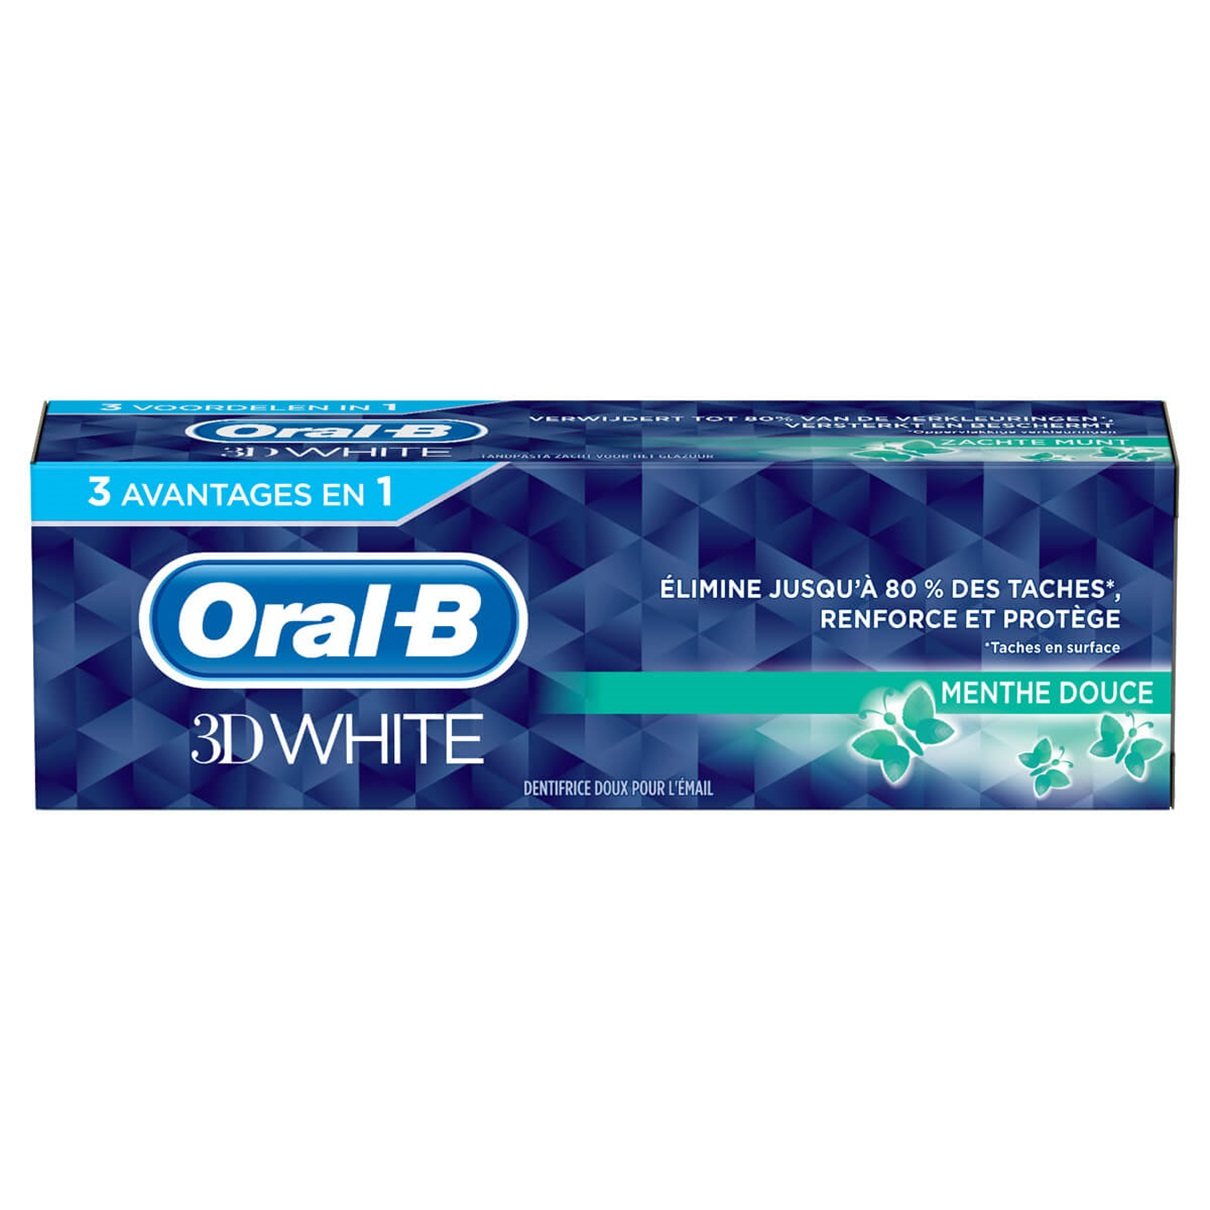 Dentifrice 3D White, Oral B (75 ml)